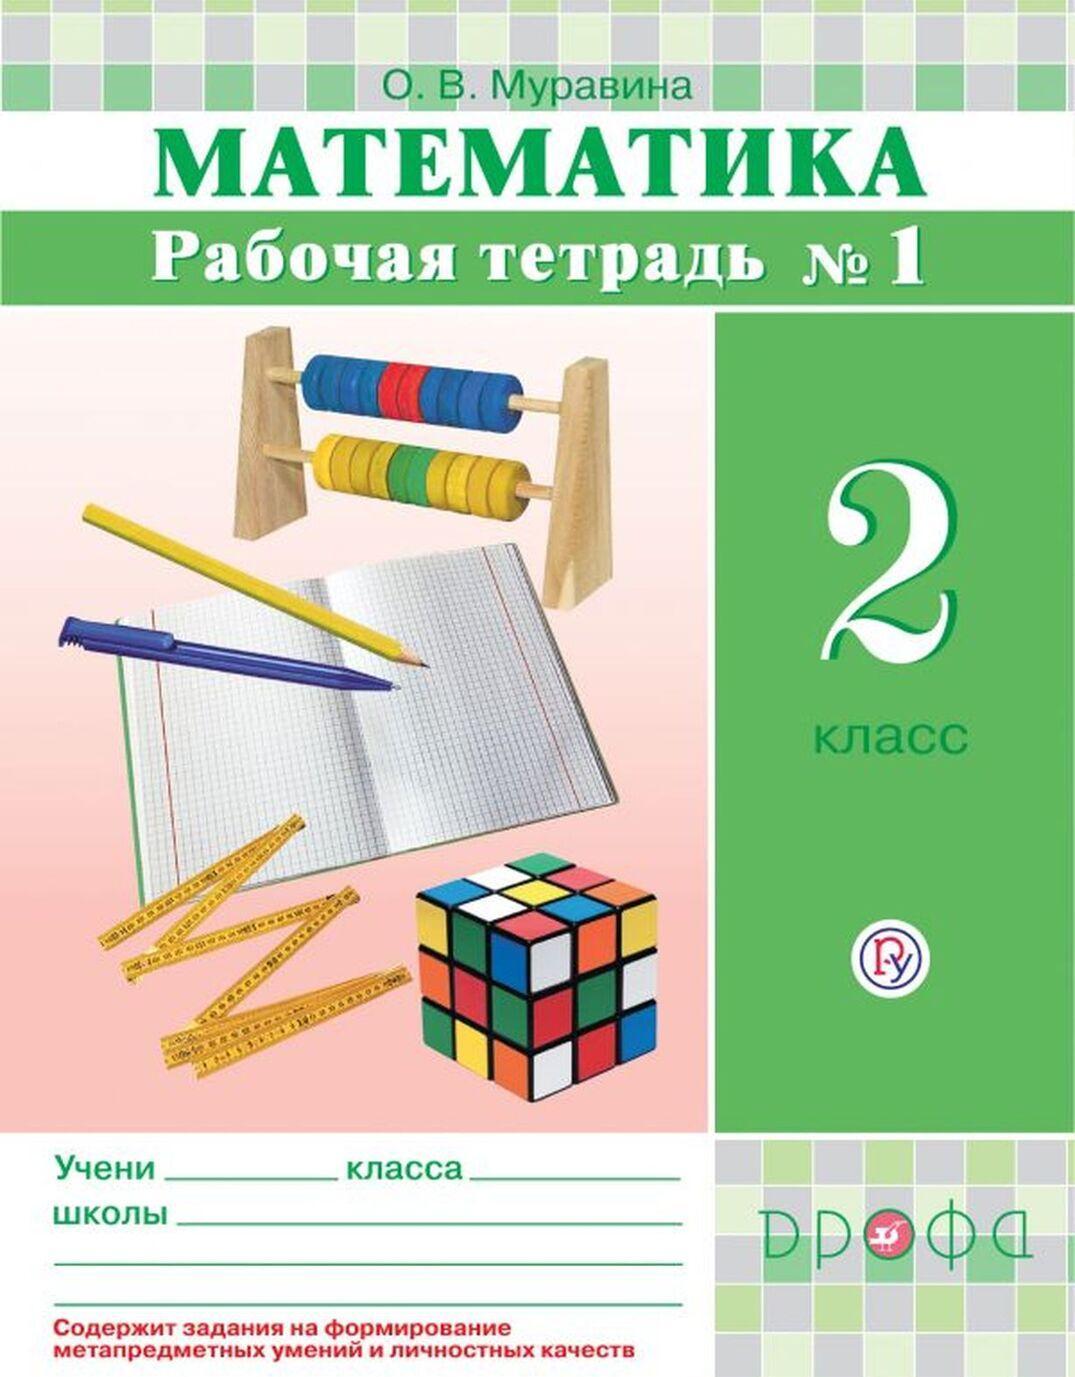 Matematika. 2 klass. Rabochaja tetrad № 1